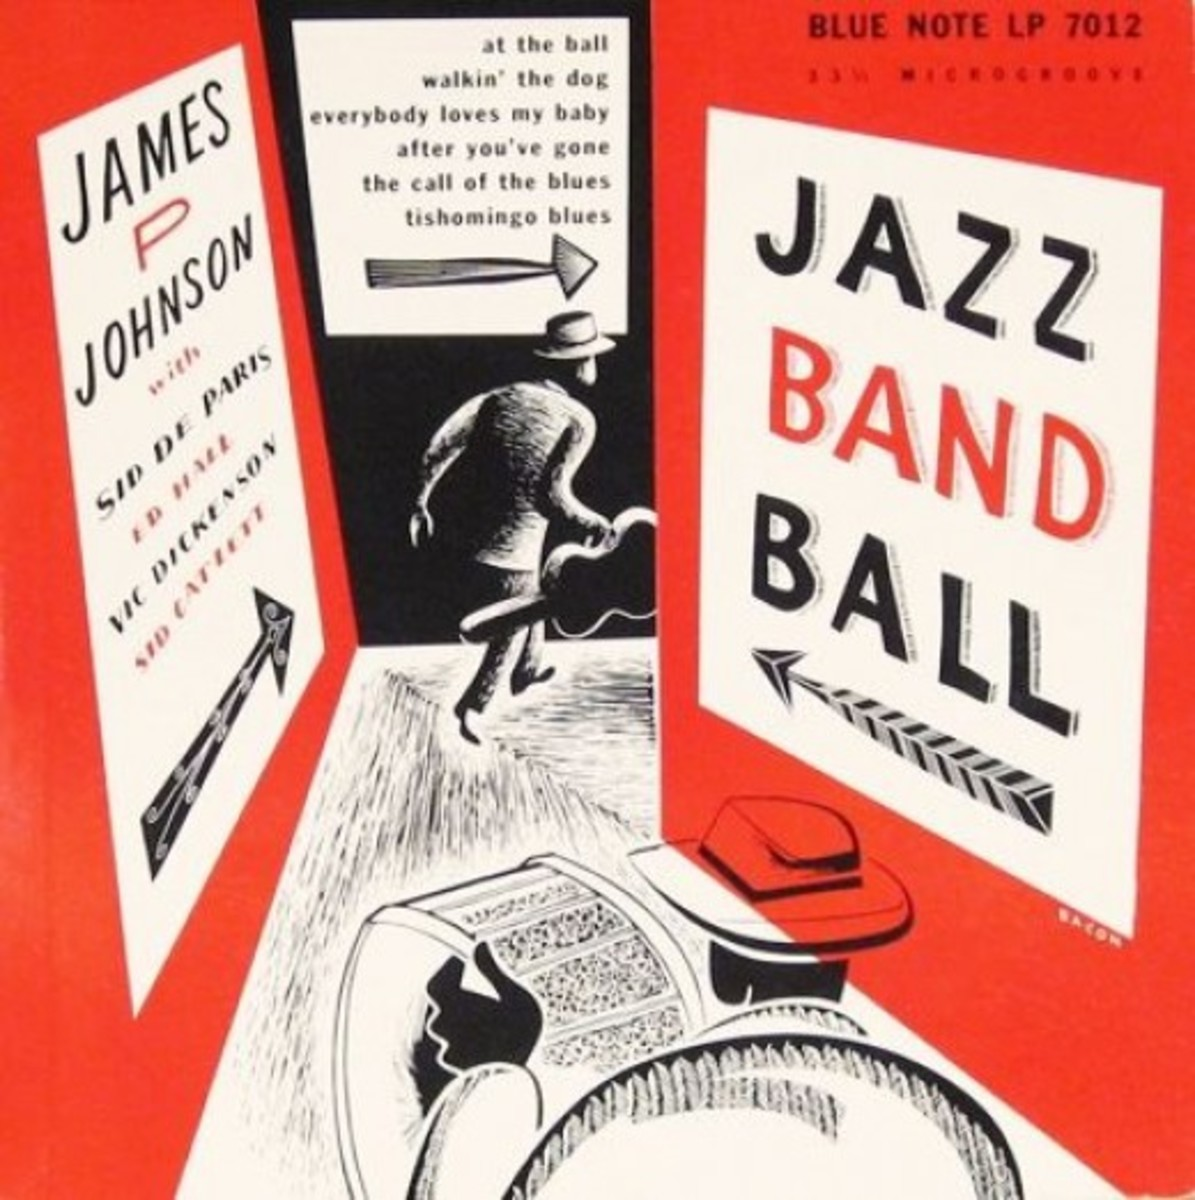 "James P Johnson ""Jazz Band Ball"" Blue Note LP 7012 10"" LP Vinyl Microgroove Record (1951) Album Cover Art & Design by Paul Bacon"